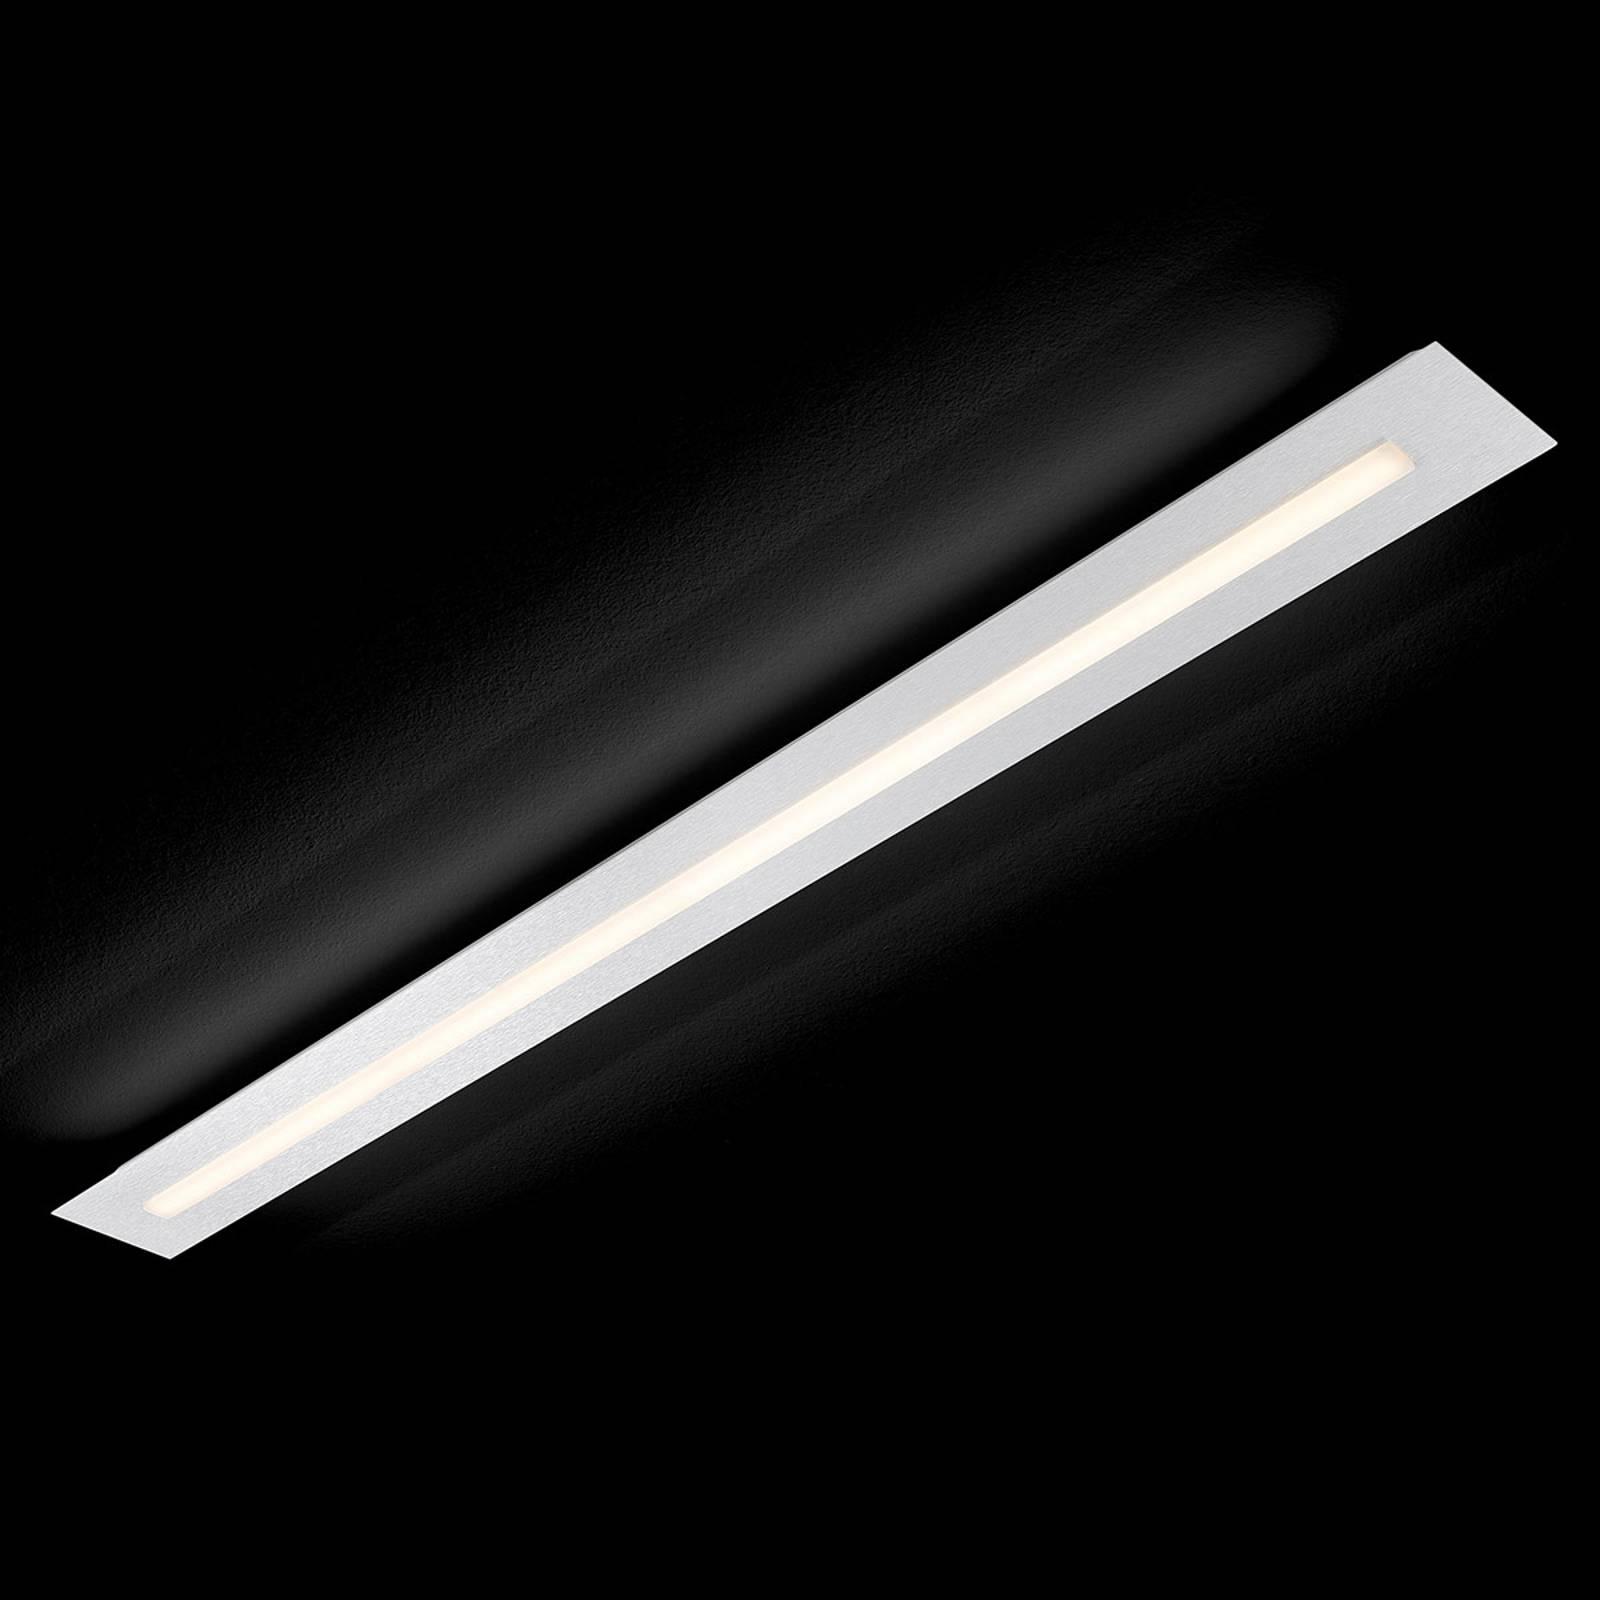 GROSSMANN Fis LED-kattovalaisin, 104 cm